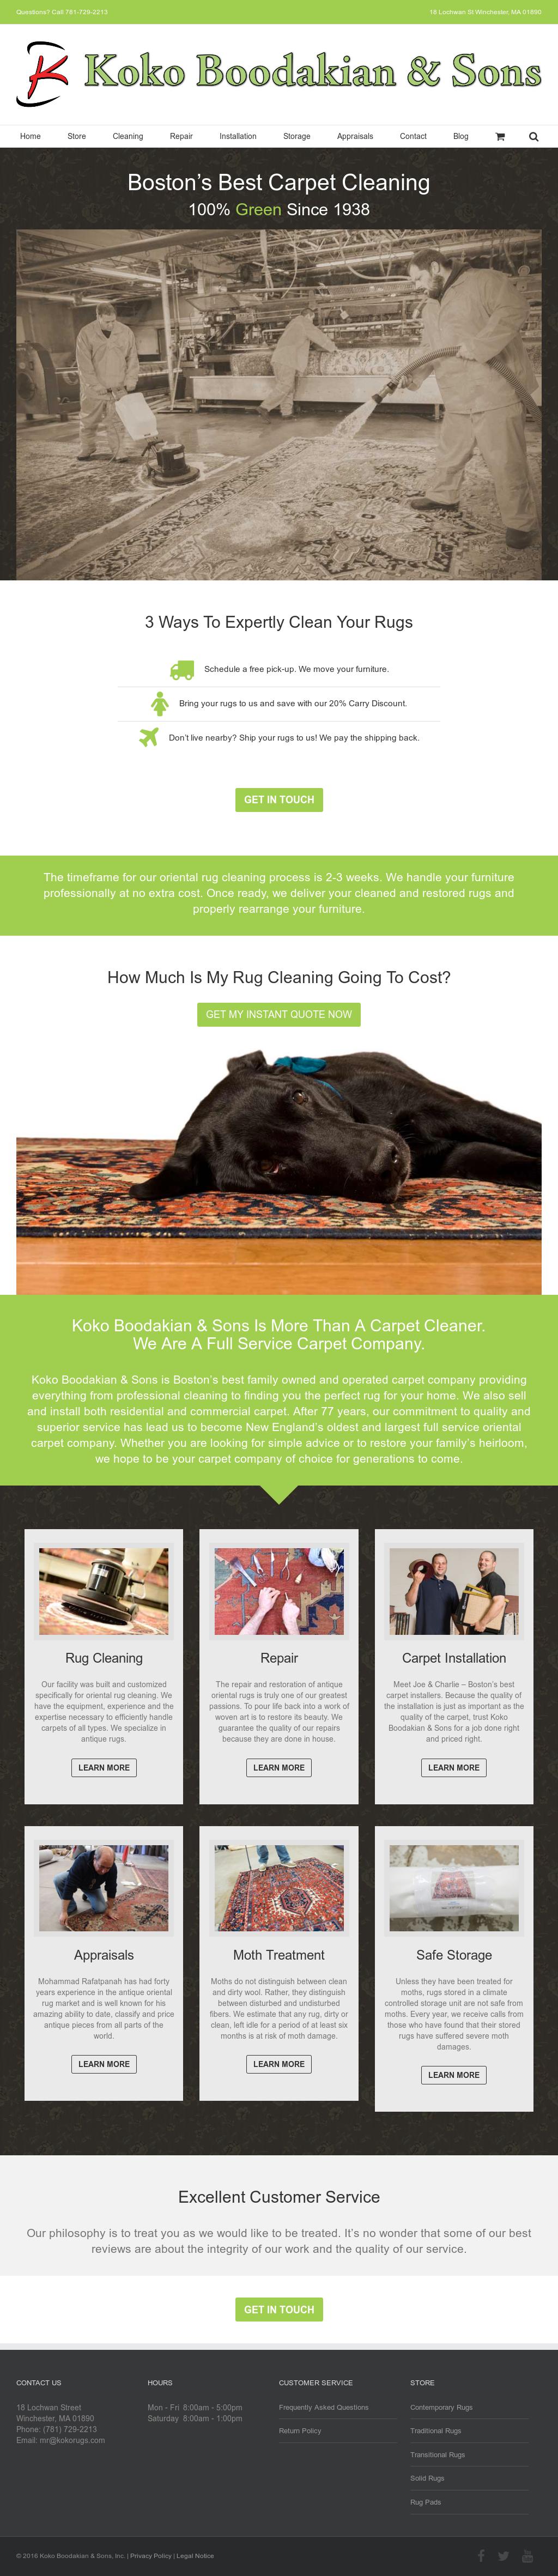 Koko Boodakian & Sons Competitors, Revenue and Employees - Owler Company Profile